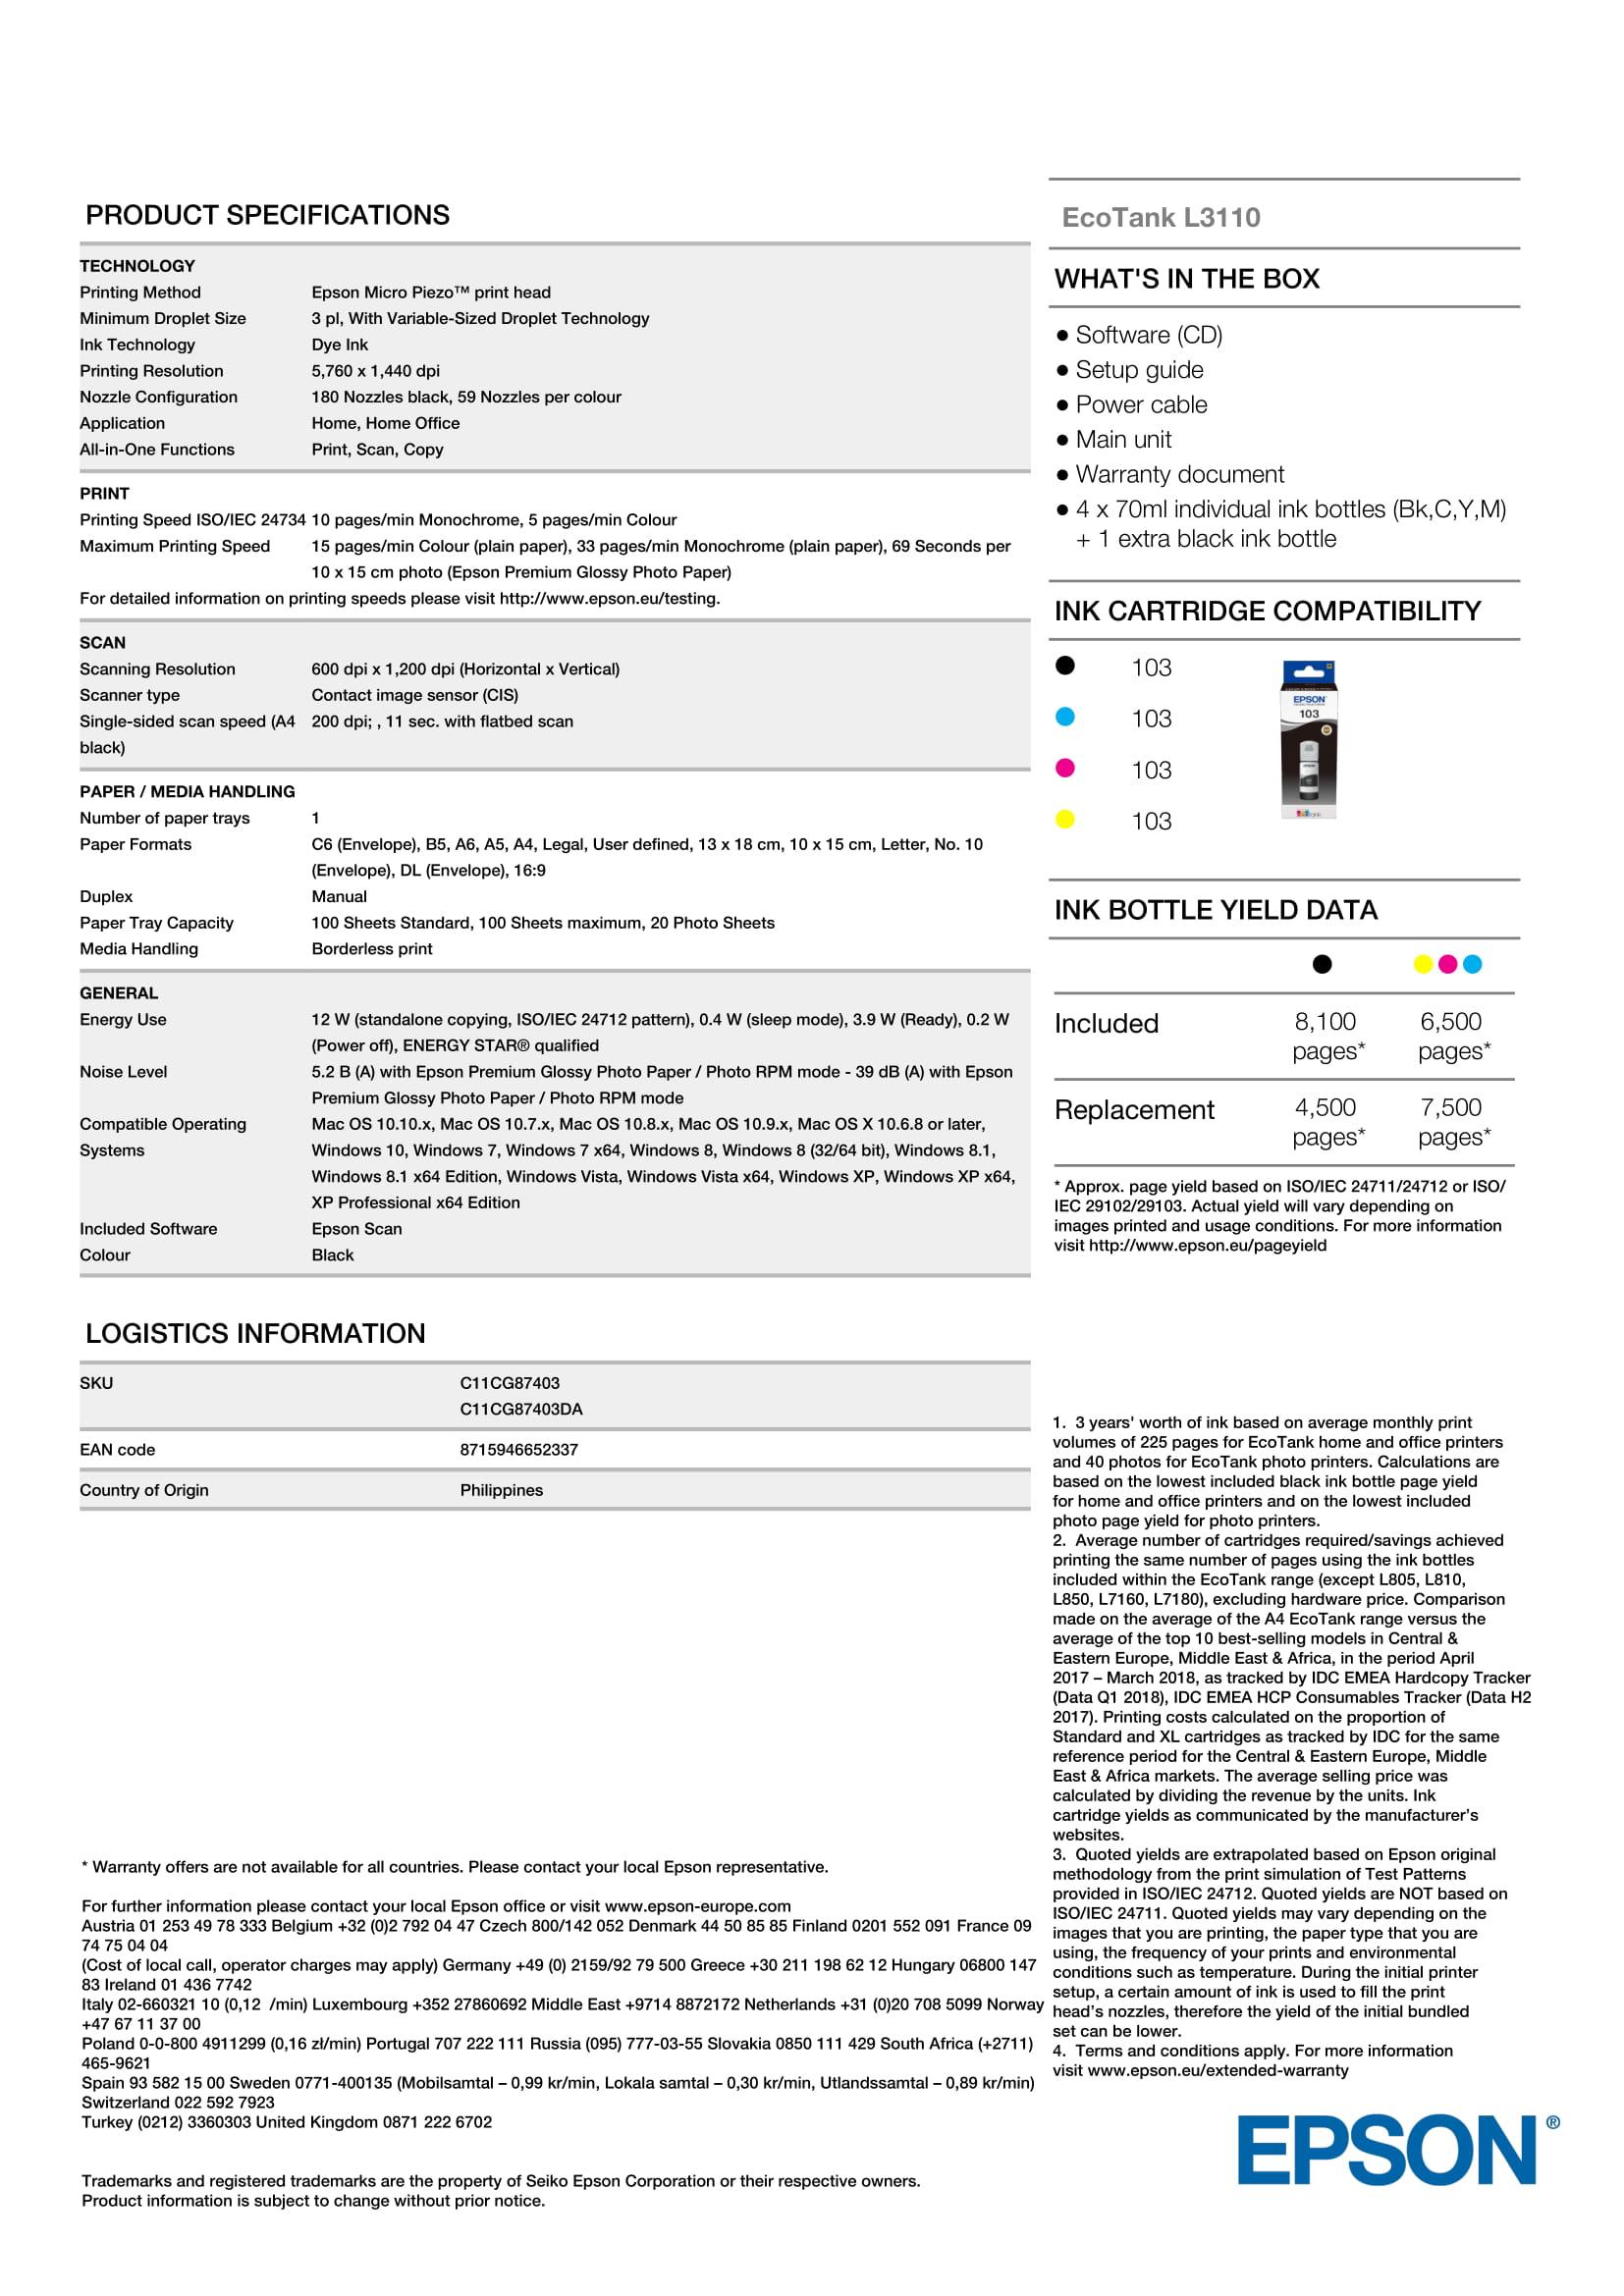 EPSON ECOTANK L3110 | Cartridge-free printing - Pearlblue Tech